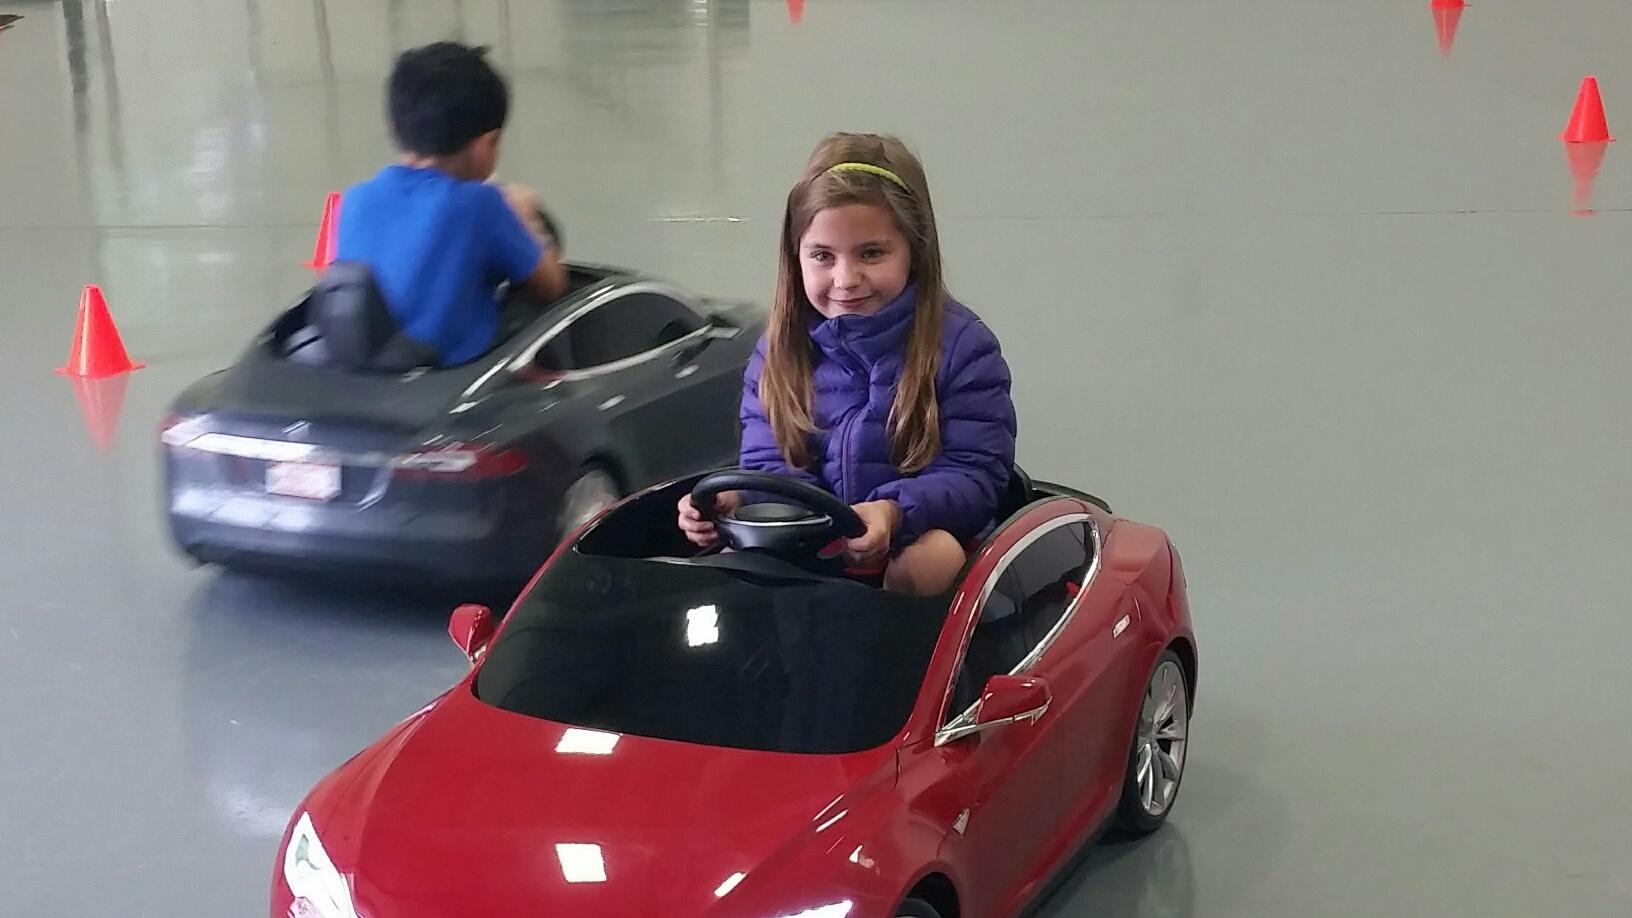 Behind the wheel: Kids test-drive Teslas in Vienna